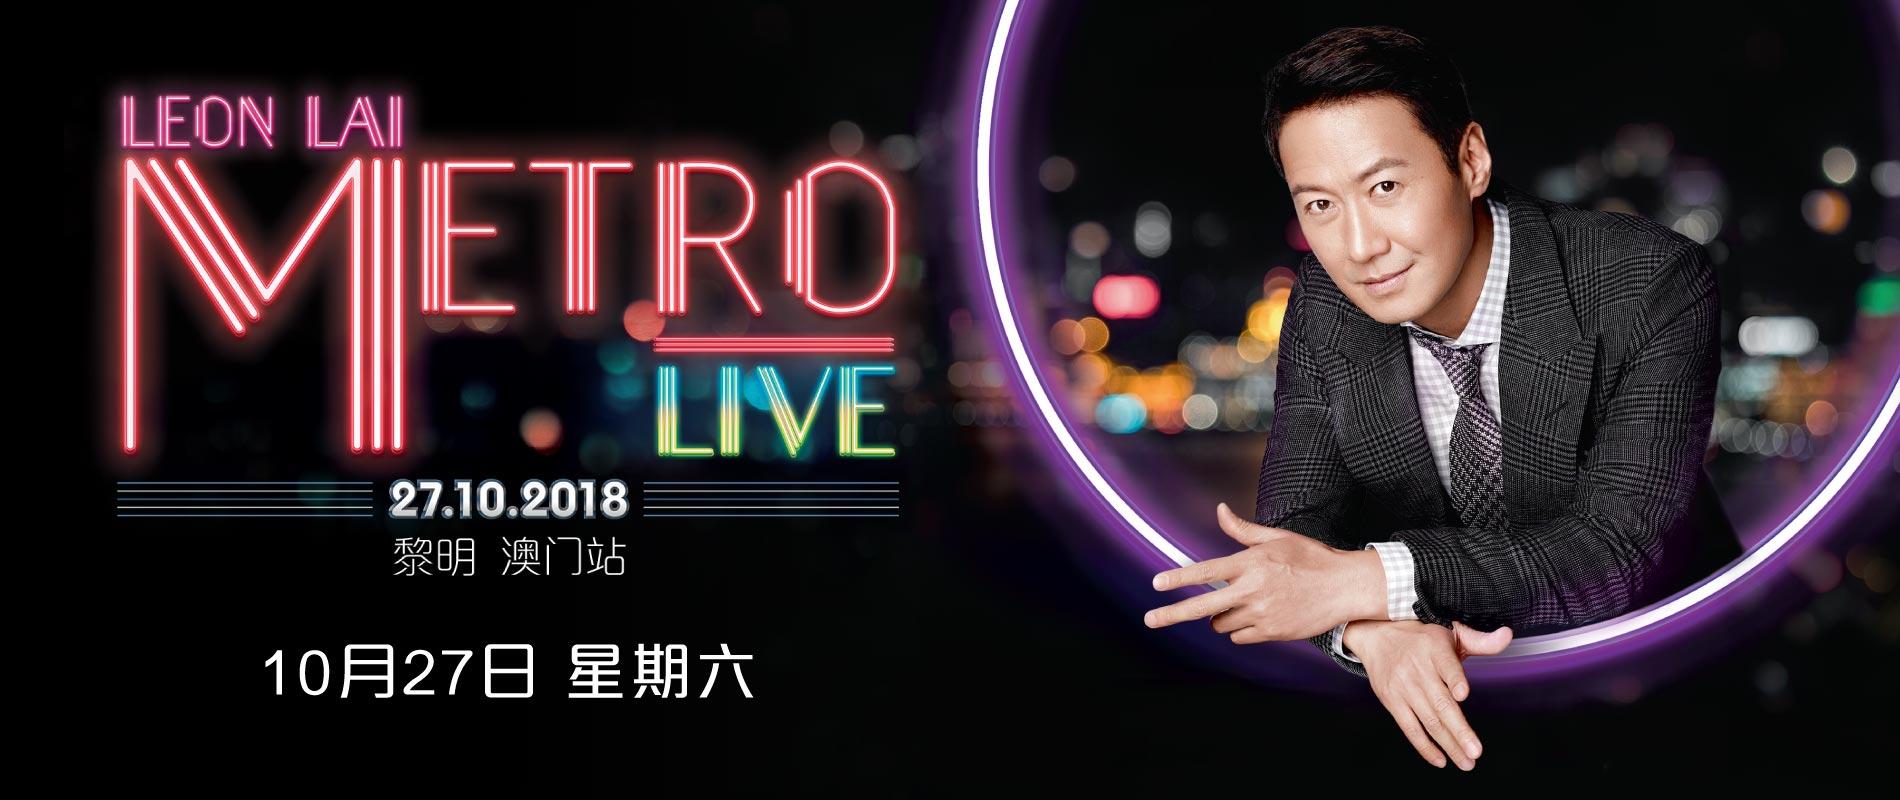 LEON METRO LIVE - 澳门威尼斯人金光综艺馆